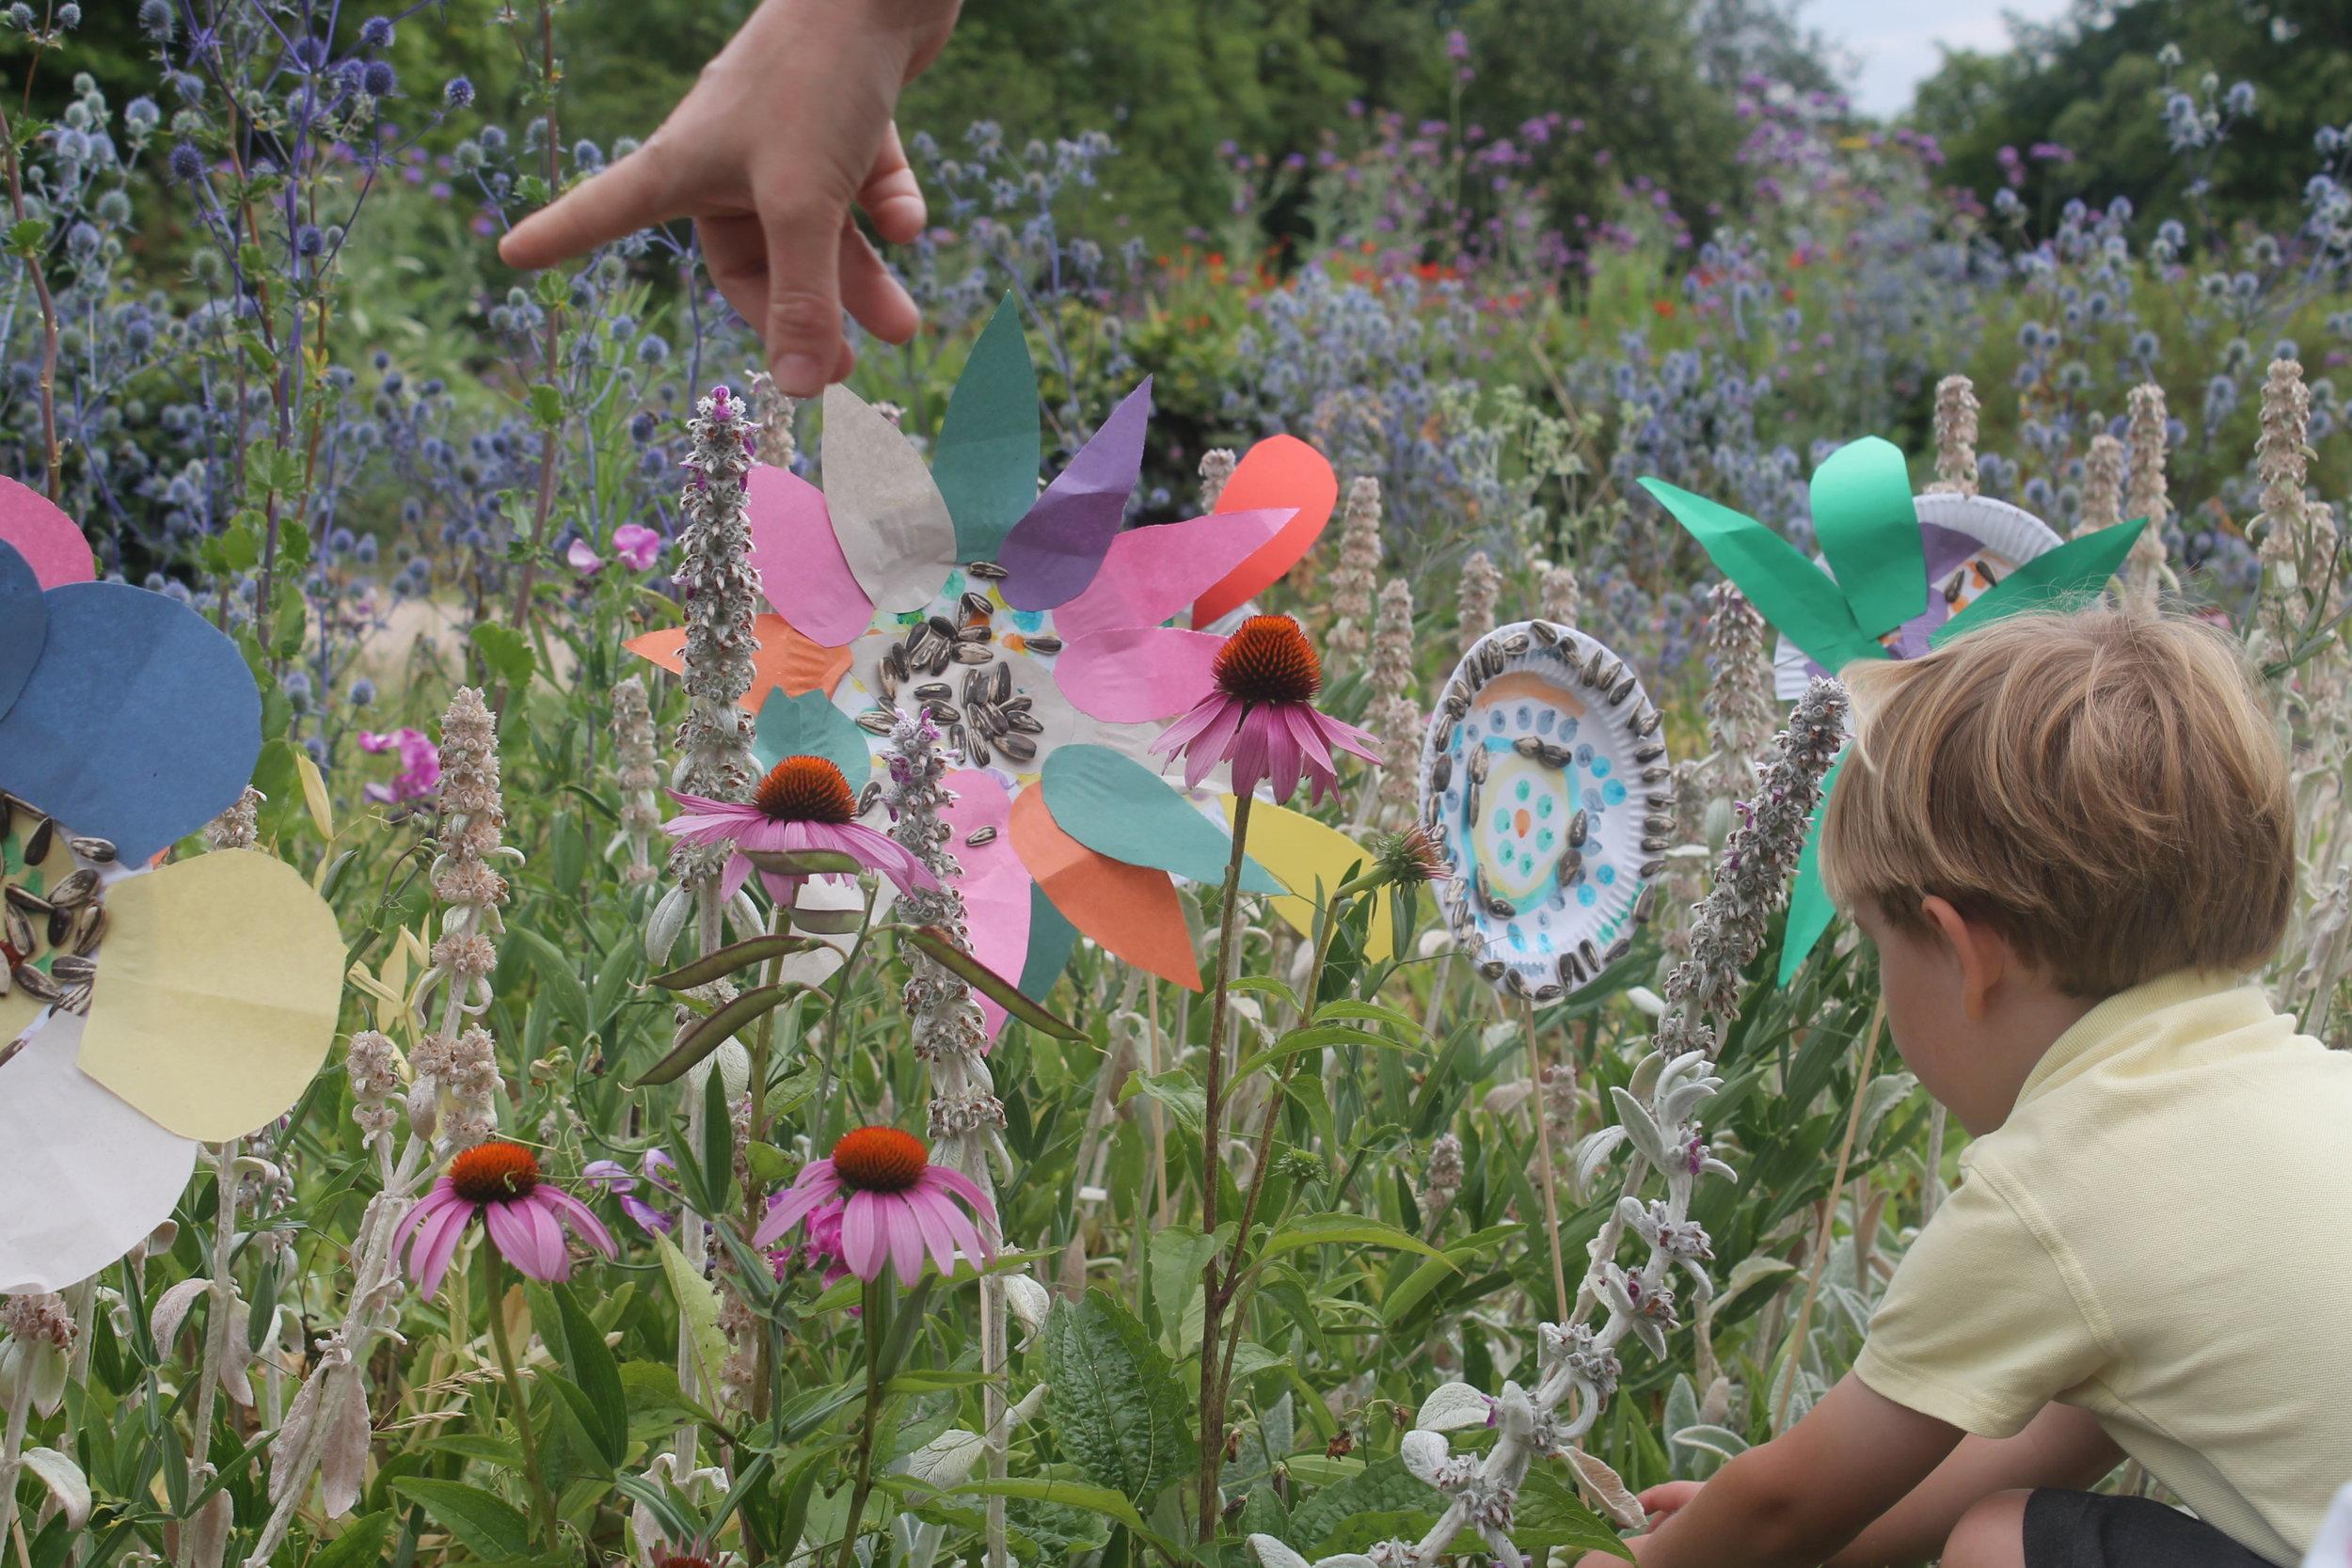 Flower hunt - William Morris garden displays their flowers.